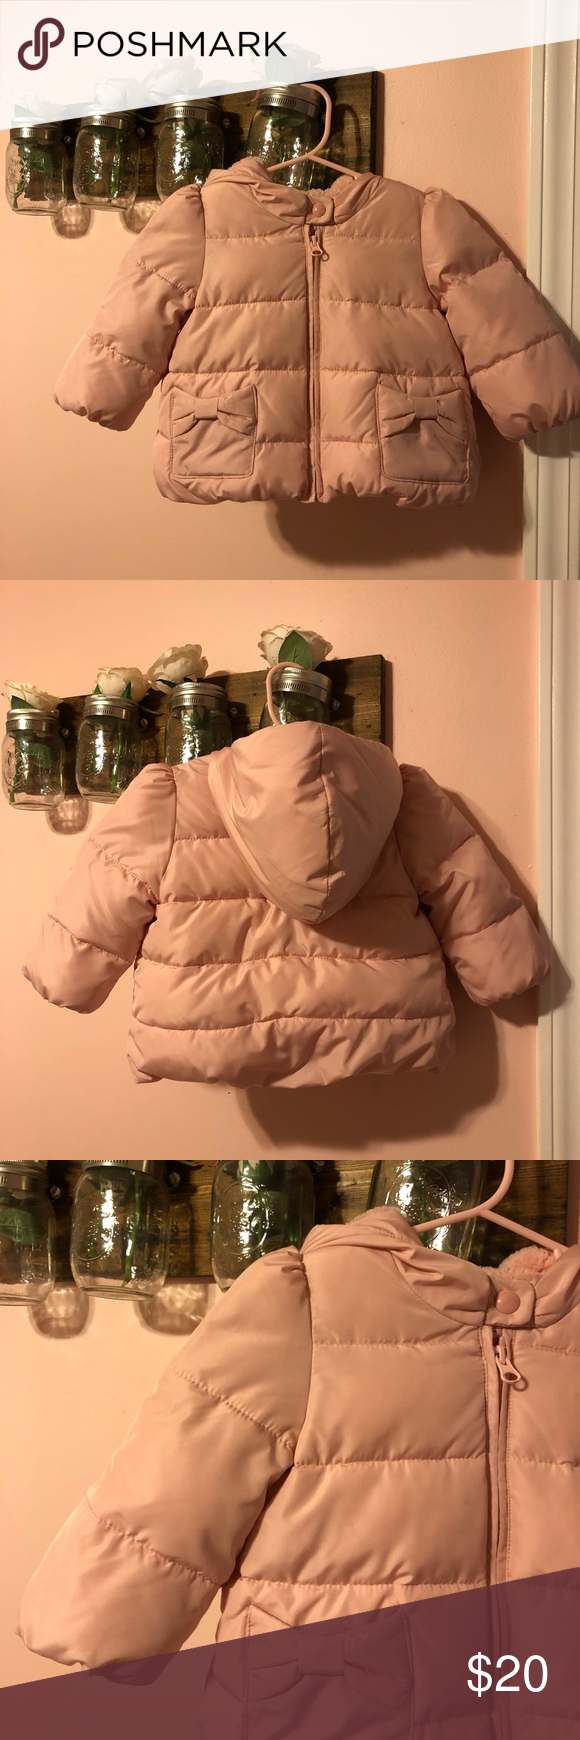 fb6f19fa7722 🎉 Host Pick 12 29 🎉 Baby Gap Puffer Jacket